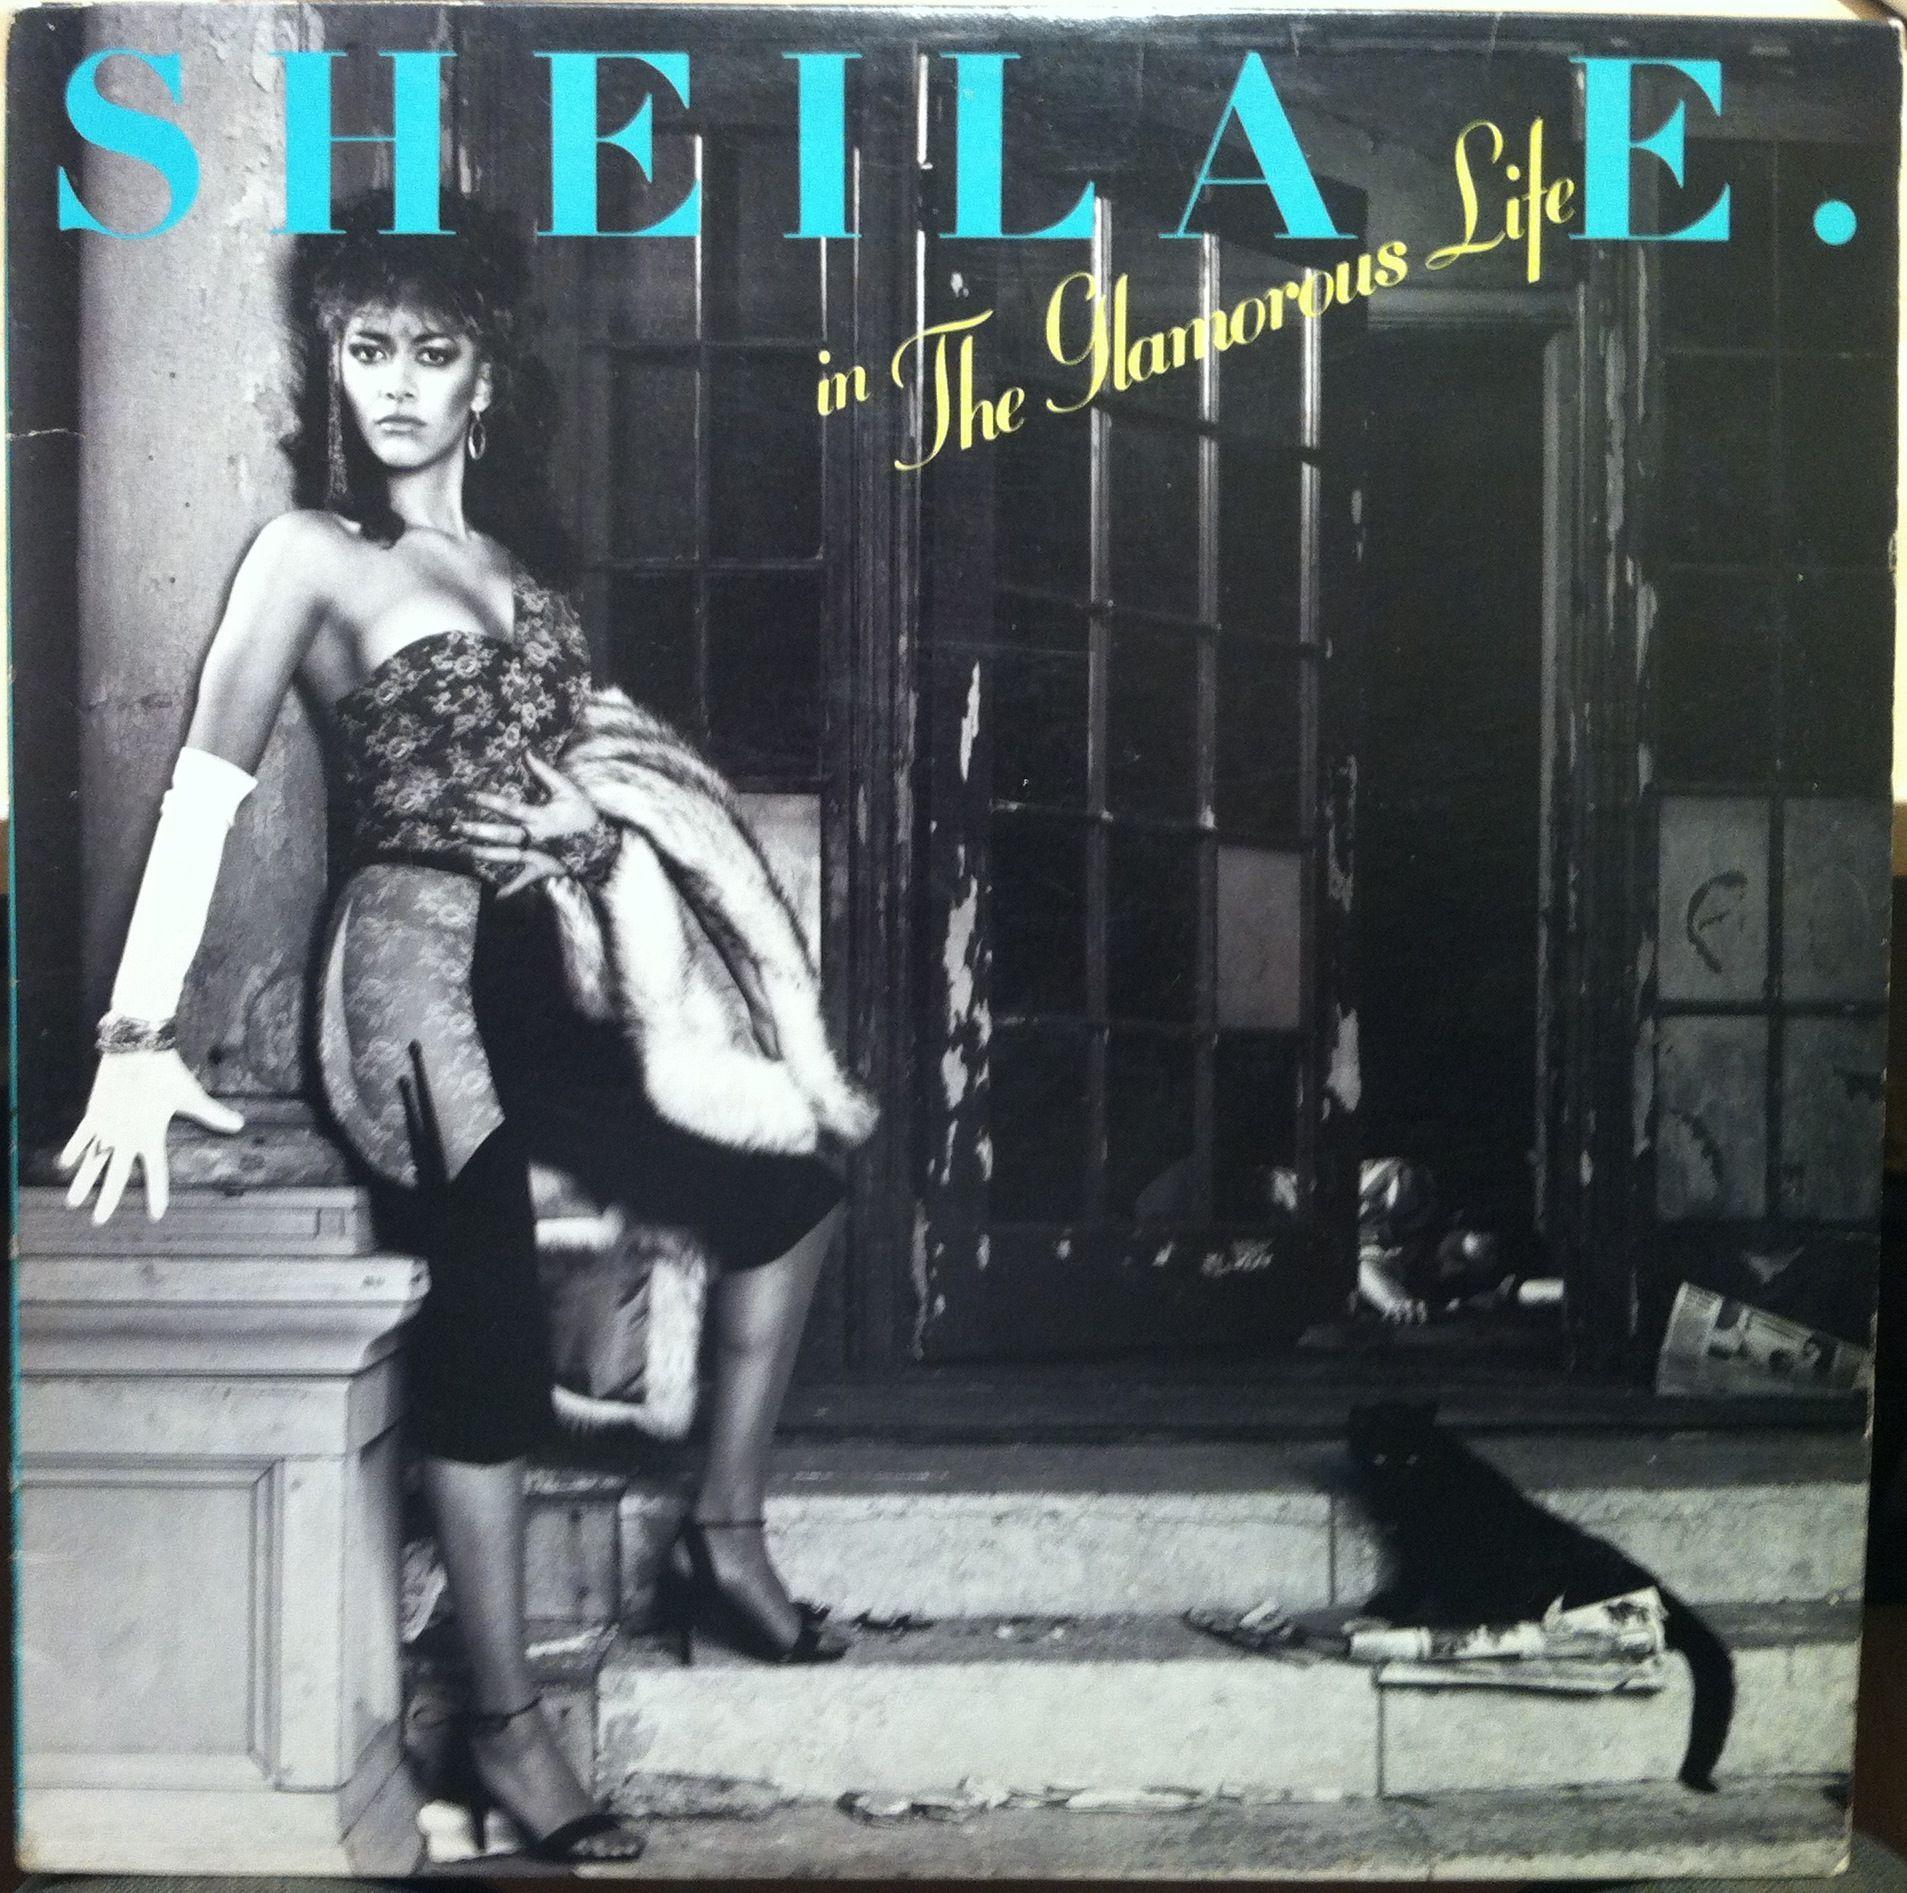 Sheila e book-3101